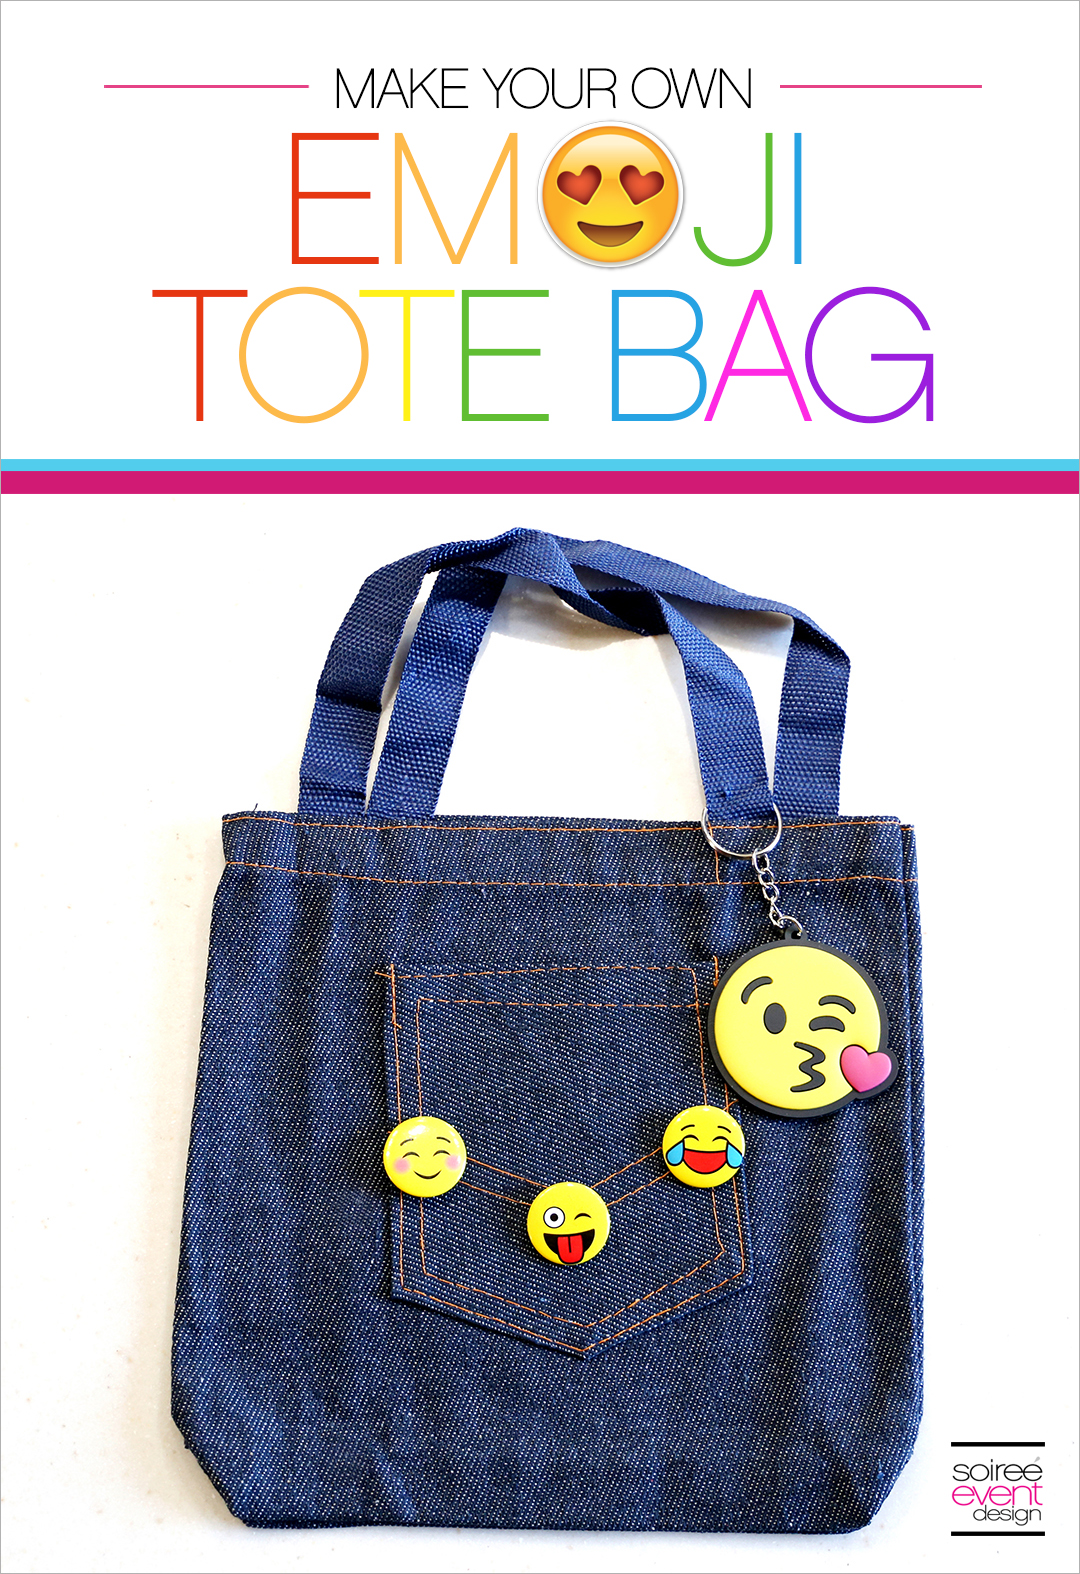 DIY Emoji Denim Tote Bag - Soiree Event Design